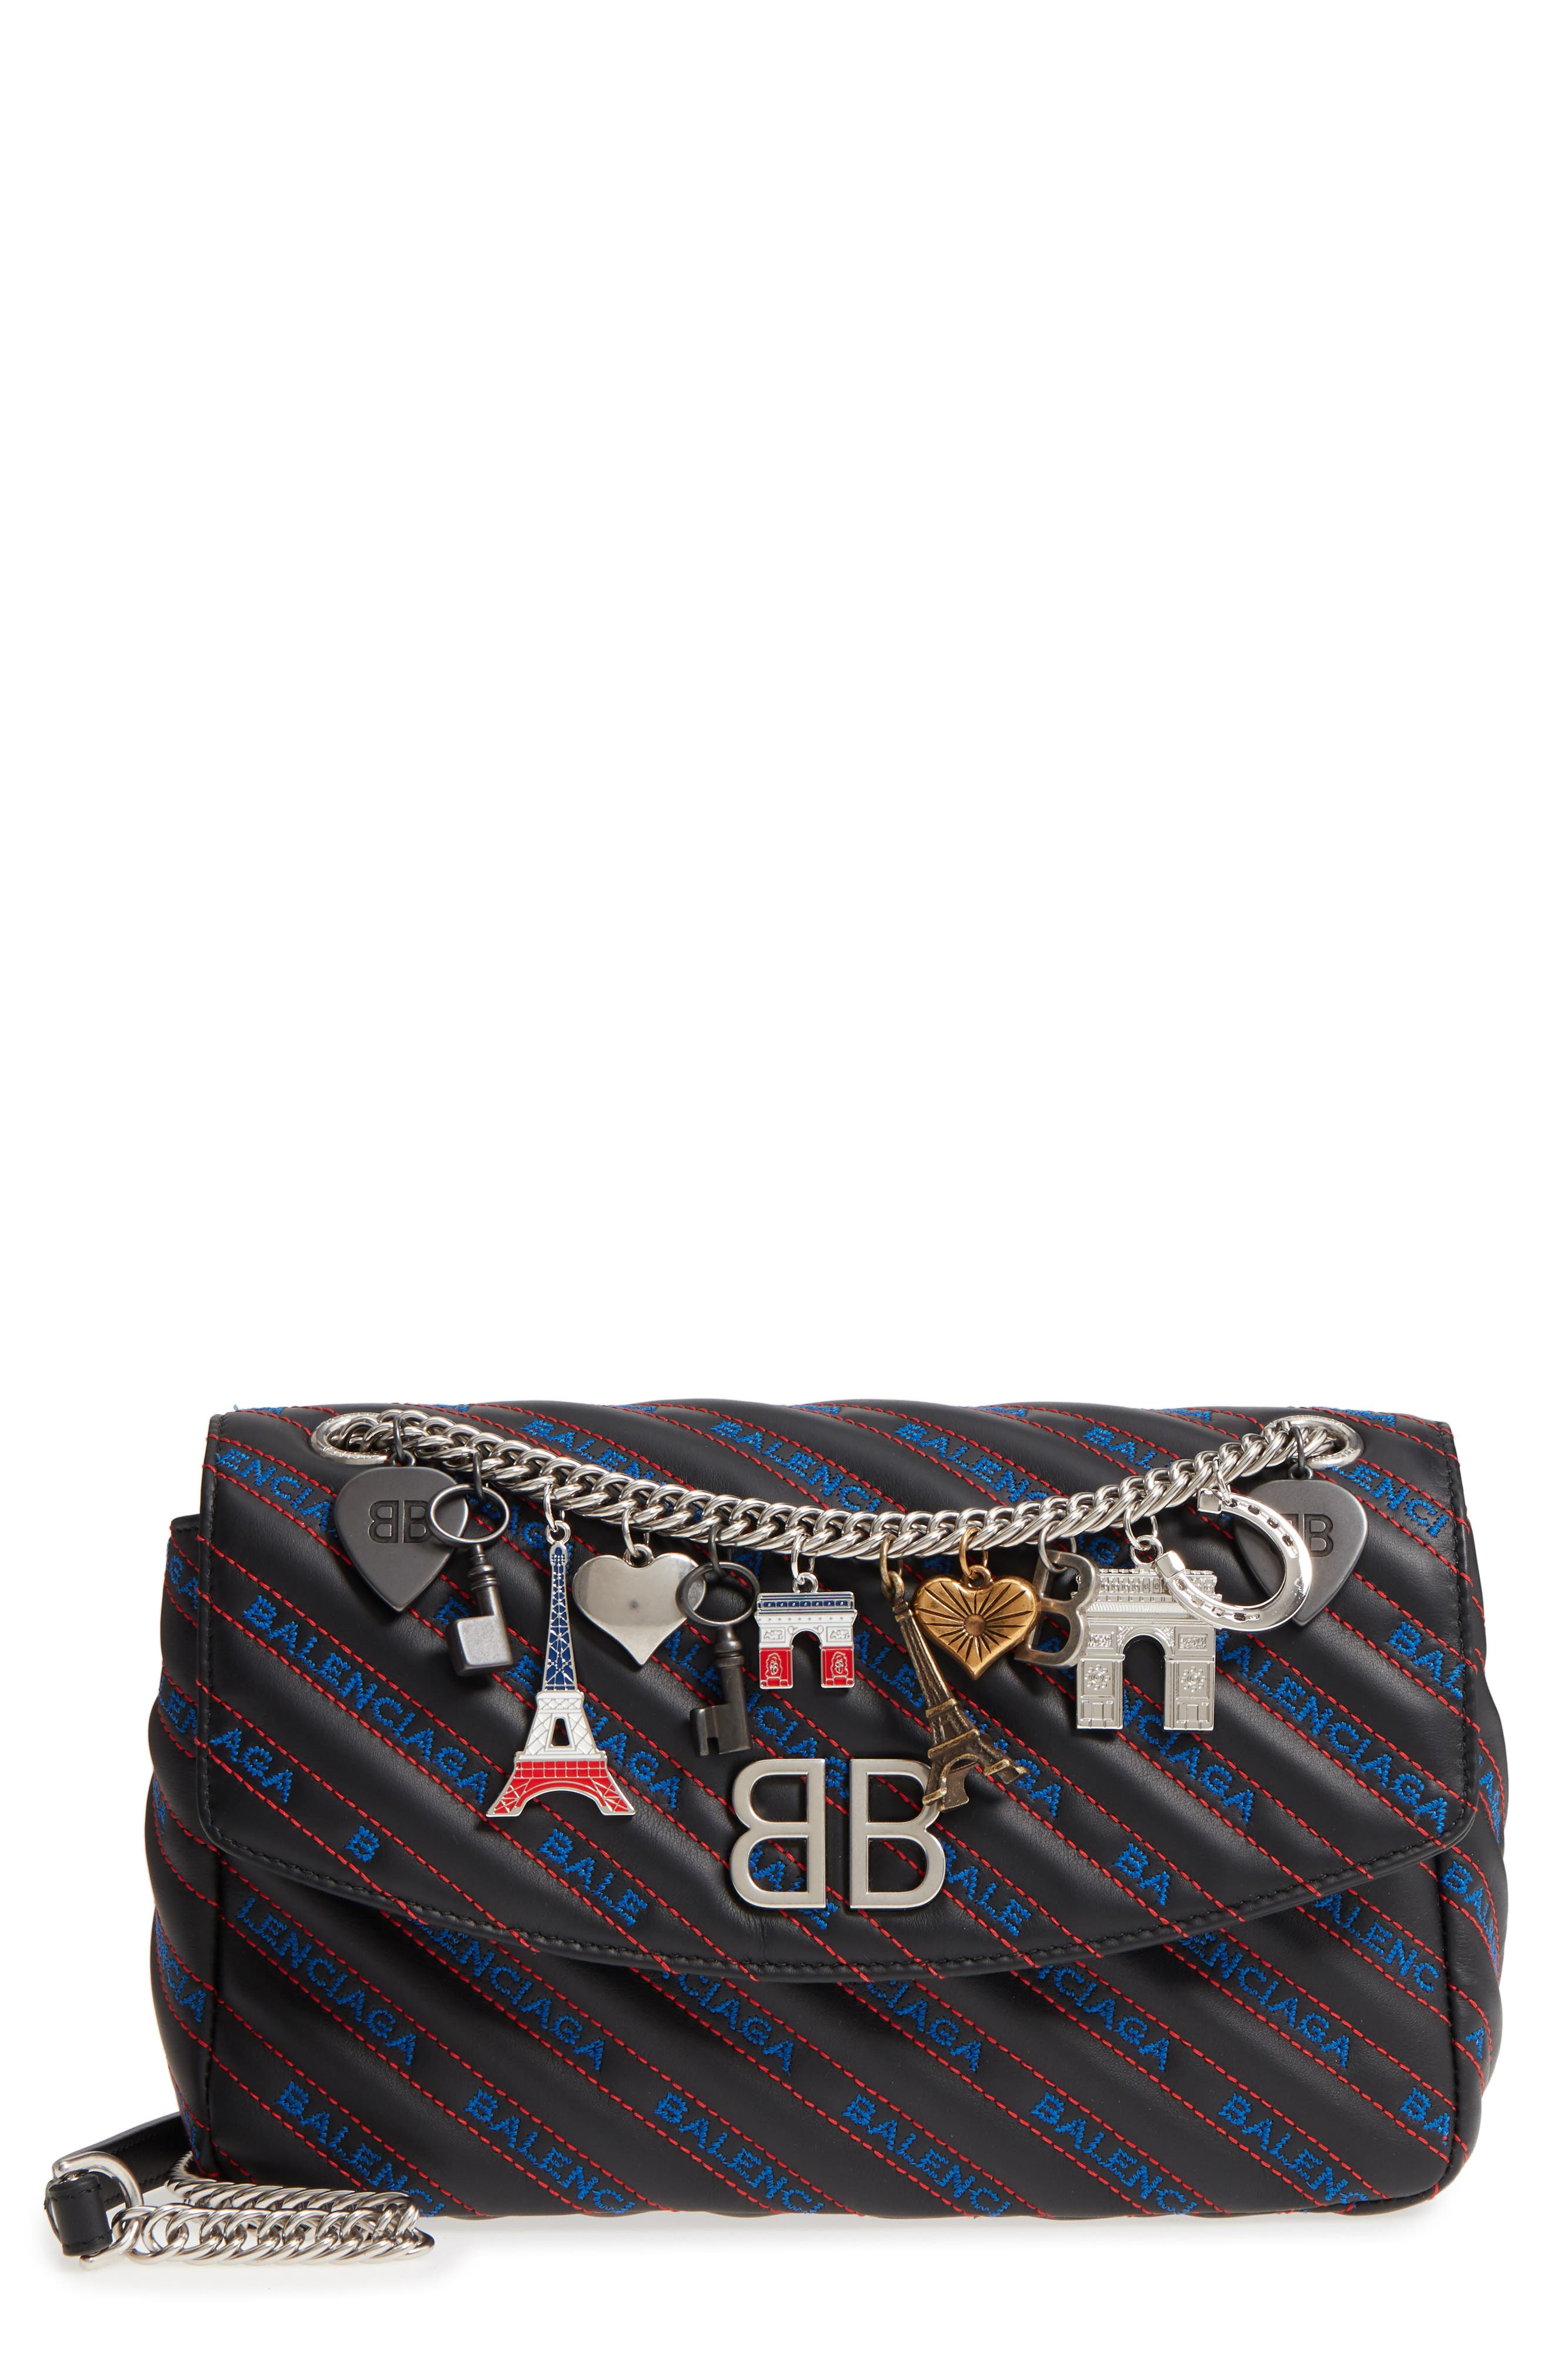 Medium BB Round Logo Charm Crossbody Bag,                             Main thumbnail 1, color,                             NOIR/ BLEU/ ROUGE